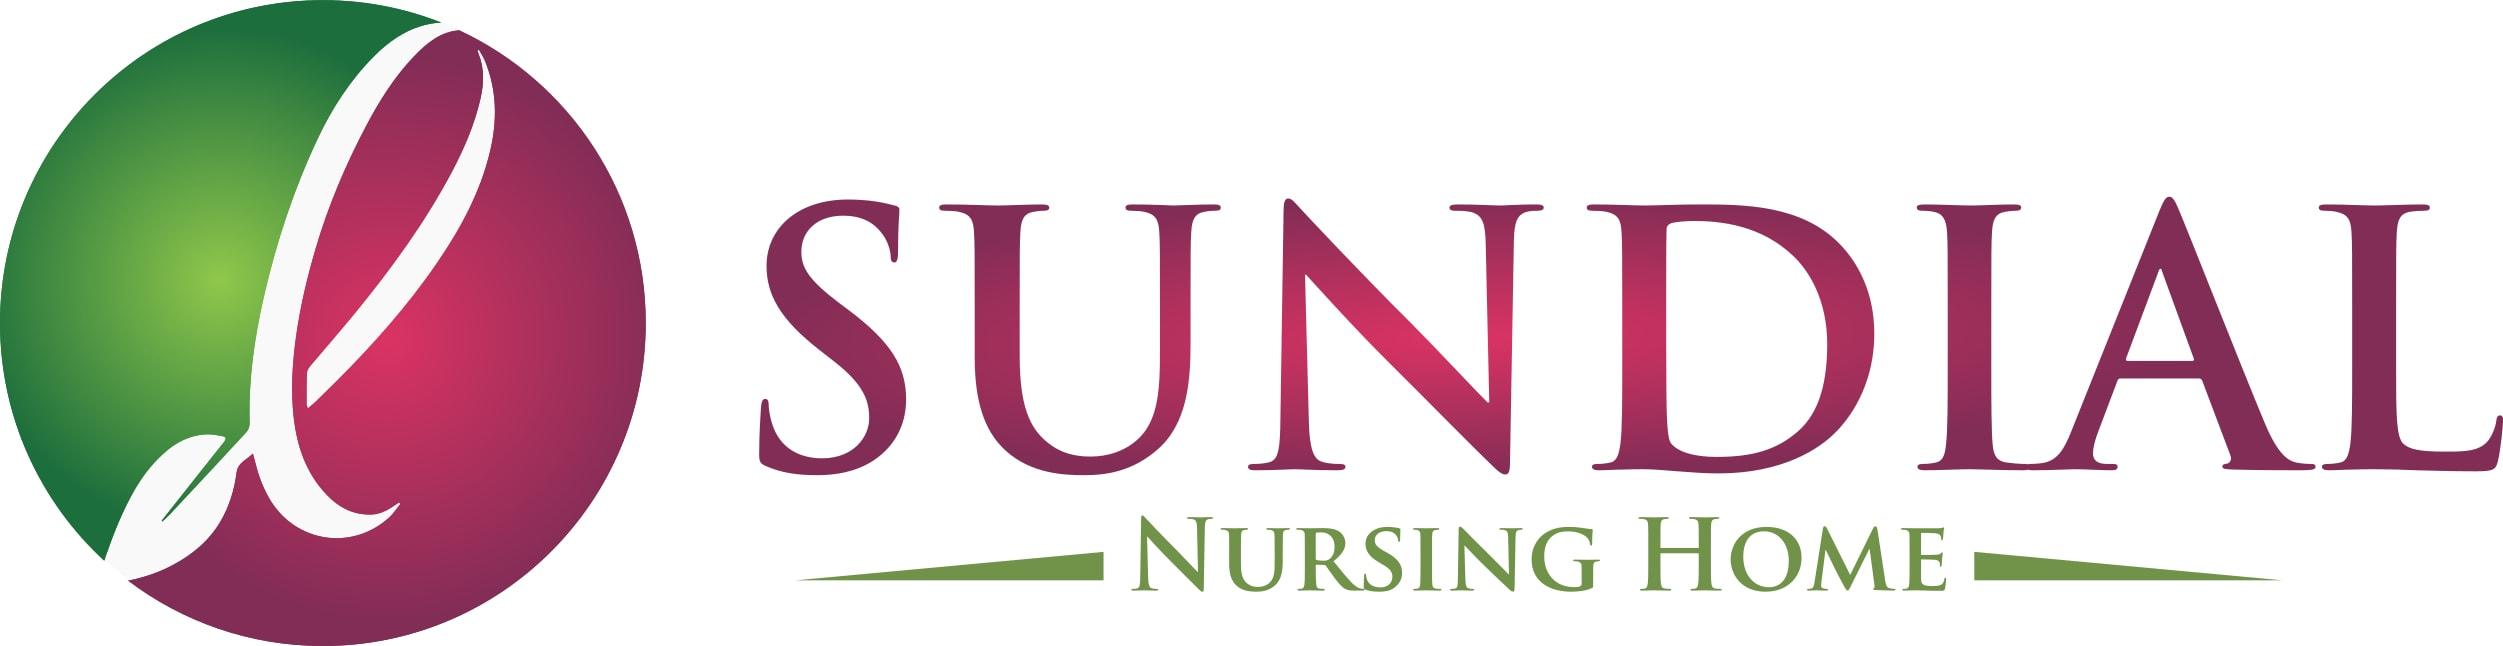 Logo of Sundial Nursing Home Nursing Homes In Sidmouth, Devon